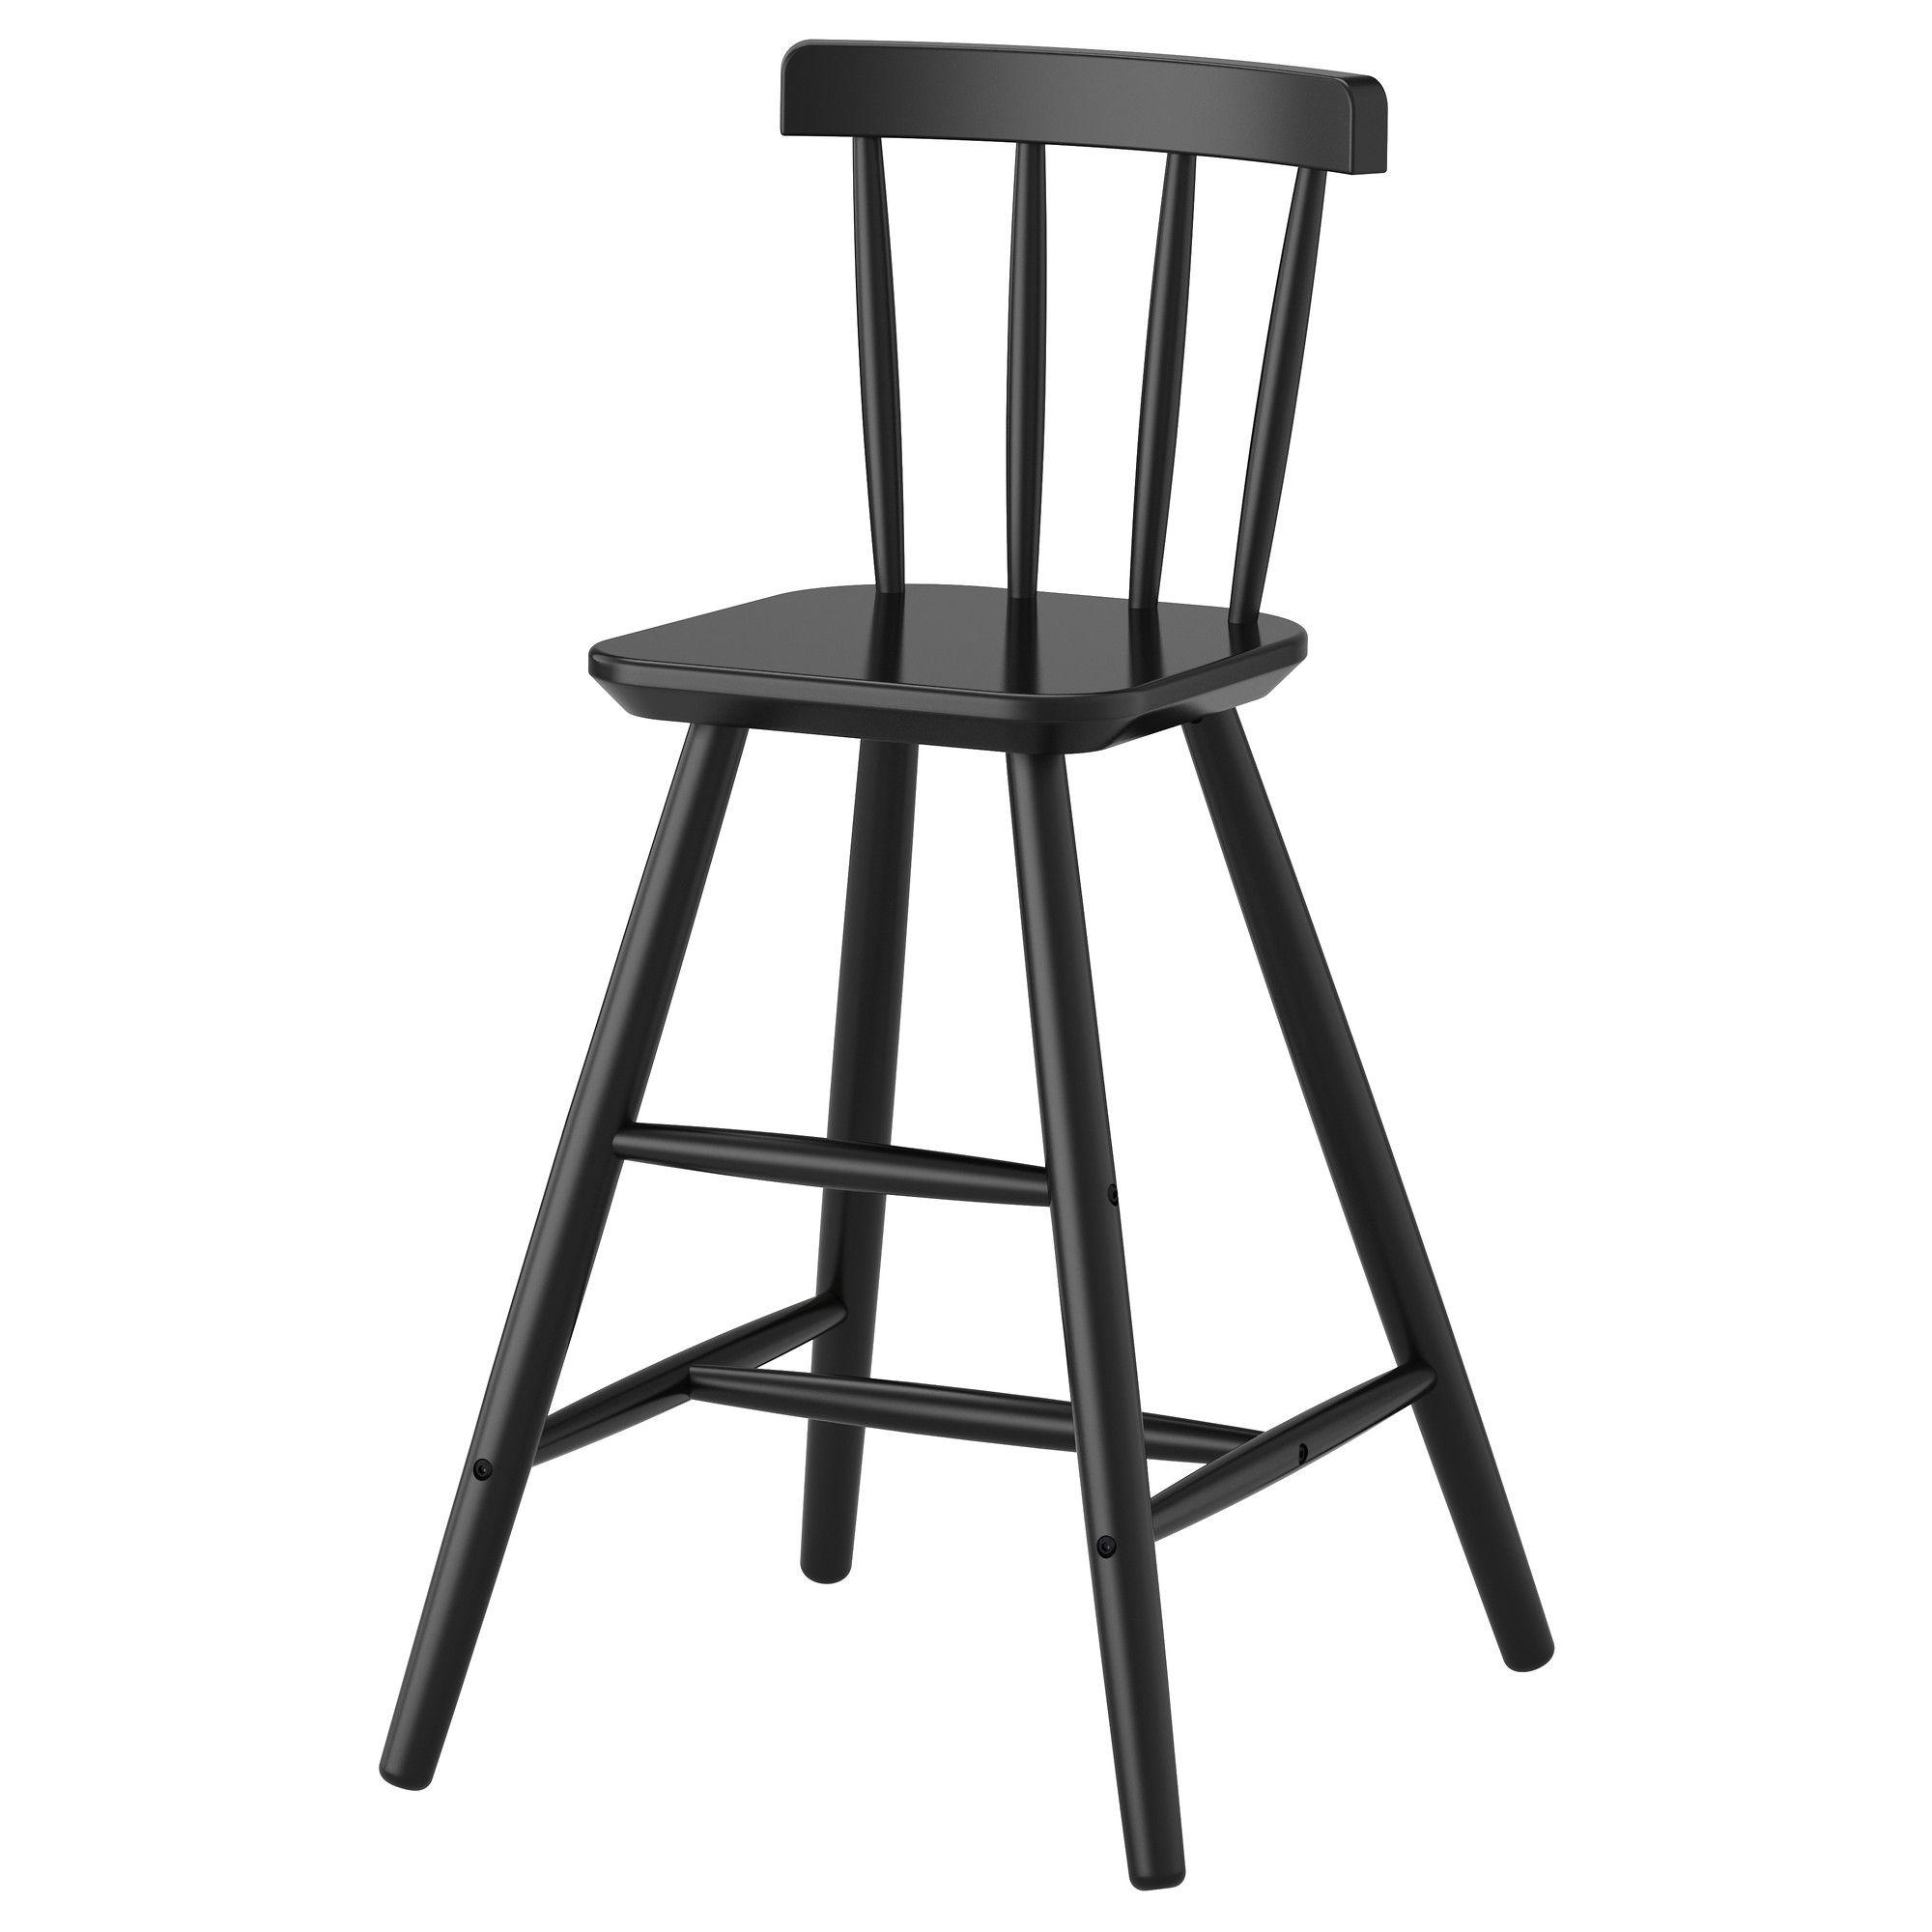 Astonishing Agam Junior Chair Black Kitchen Dining Ikea Junior Andrewgaddart Wooden Chair Designs For Living Room Andrewgaddartcom